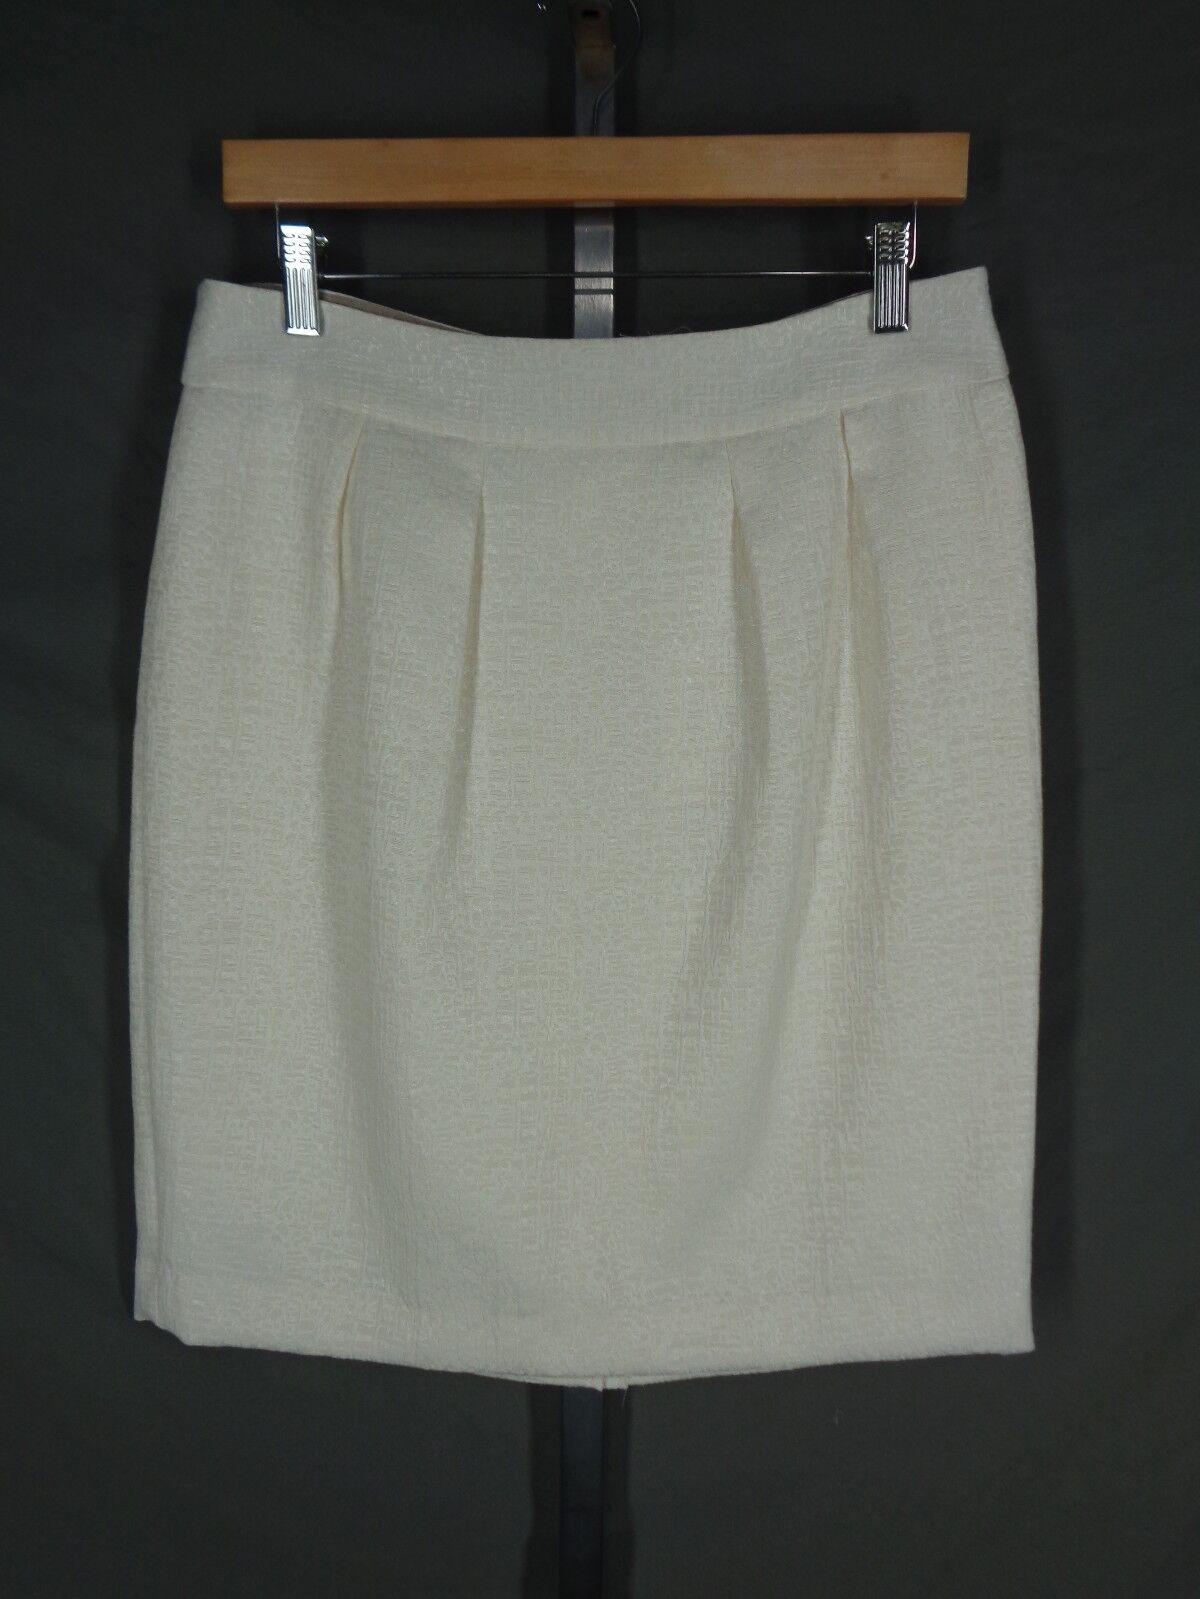 Banana Republic Skirt Size 10 Ivory Cream Jacquard Pleated Straight Pencil New